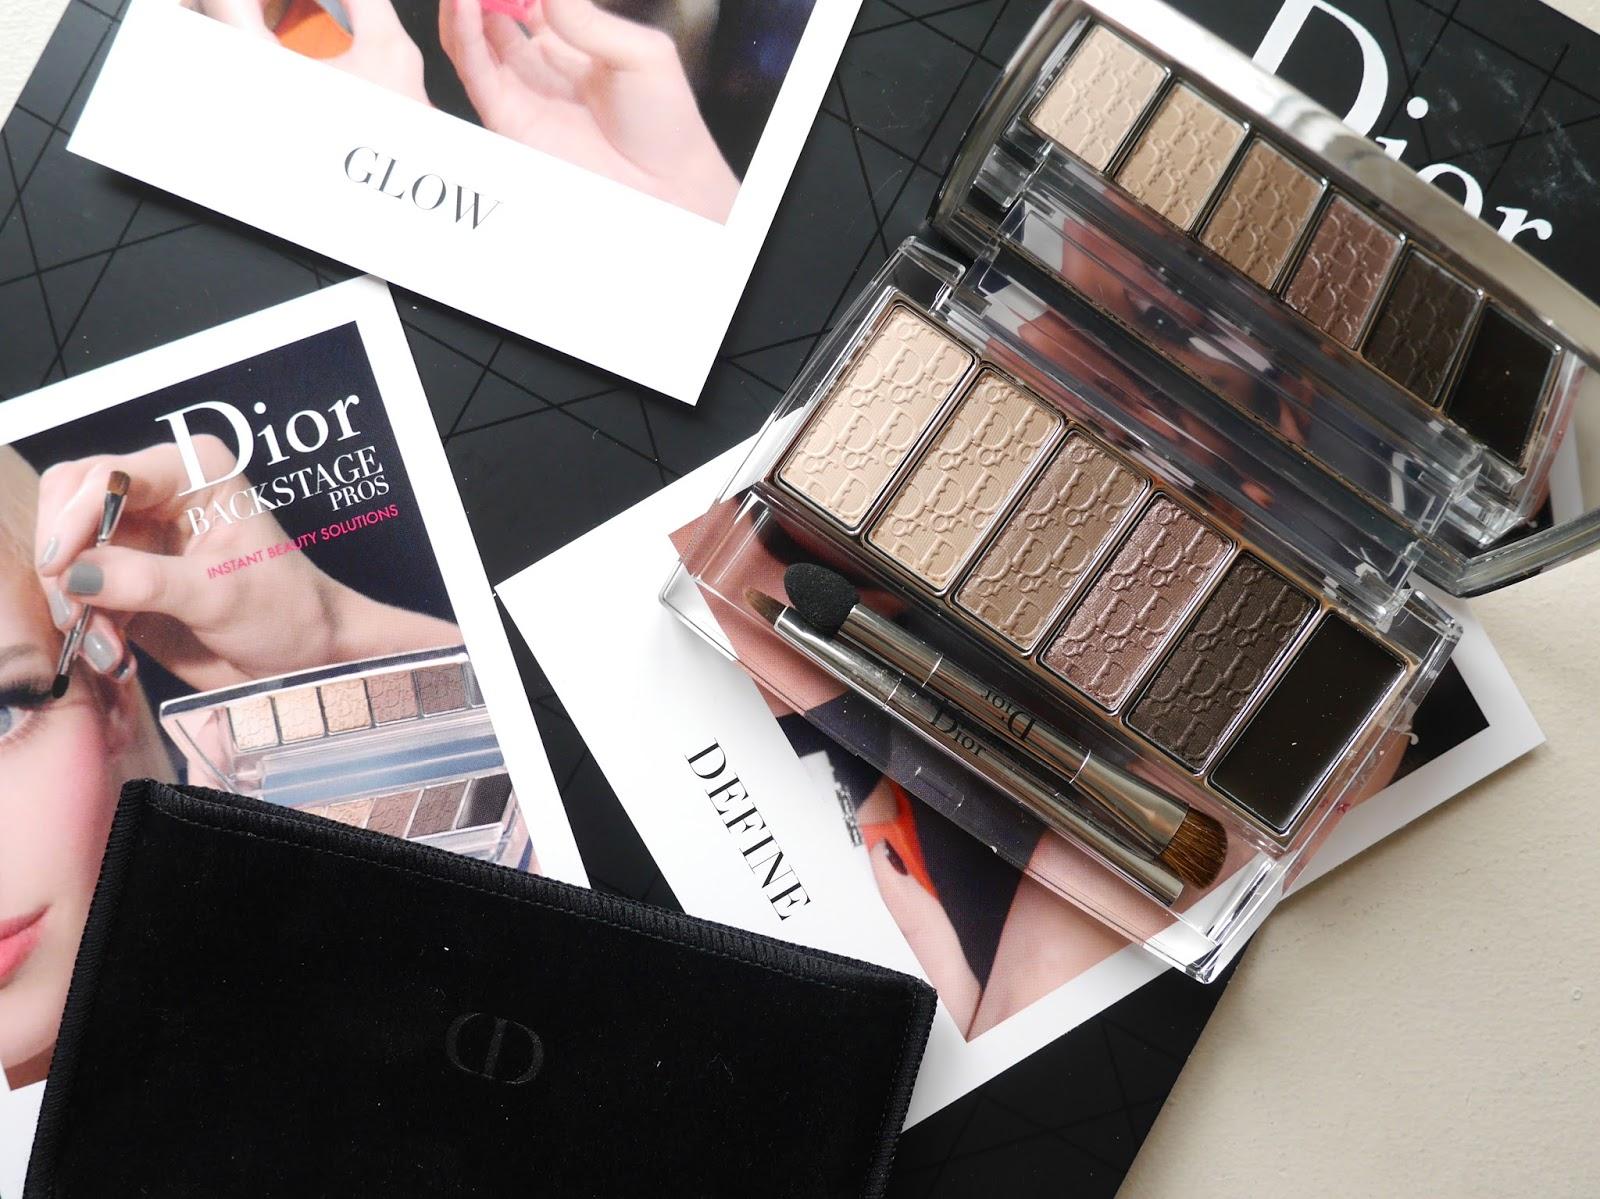 review swatch Dior Eye Reviver Illuminating Neutrals nude eyeshadow palette